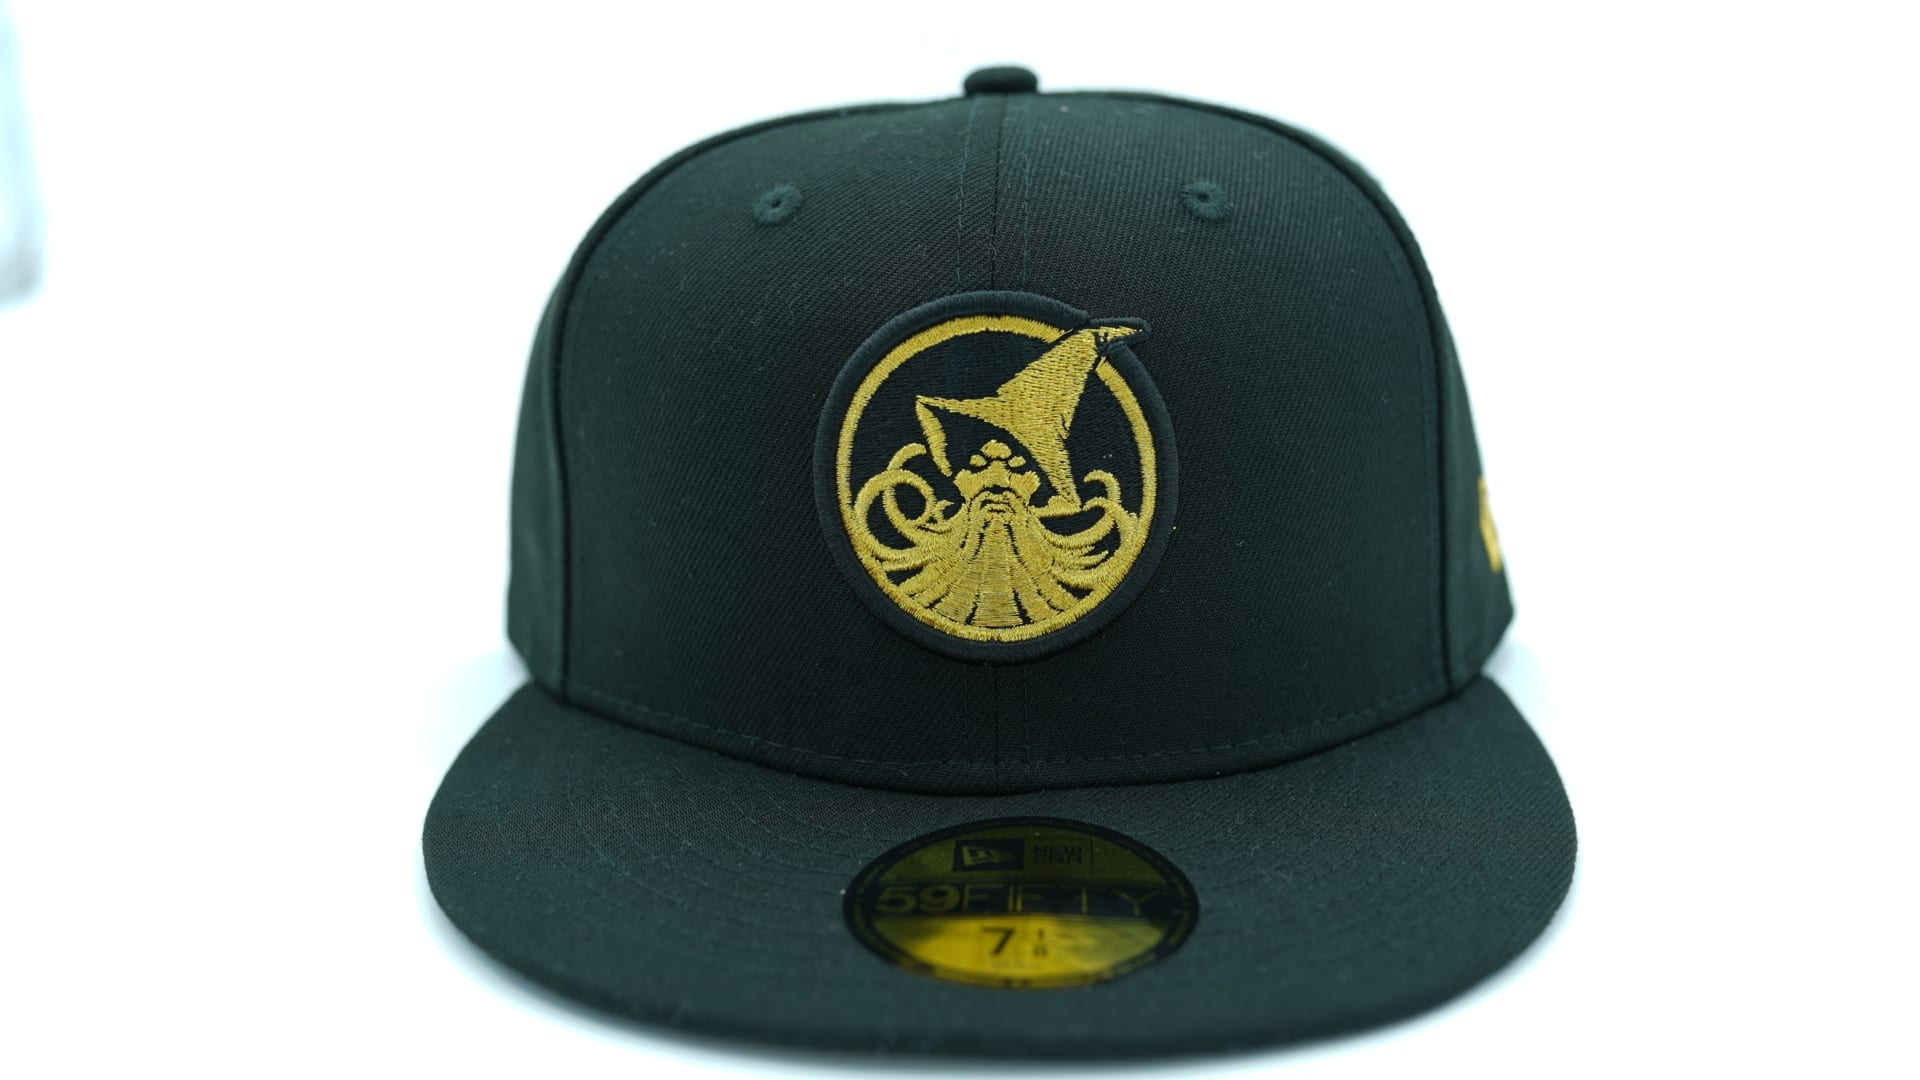 Los-Angeles-Angels-pro-model-Halo-baseball-hat-cap-1960